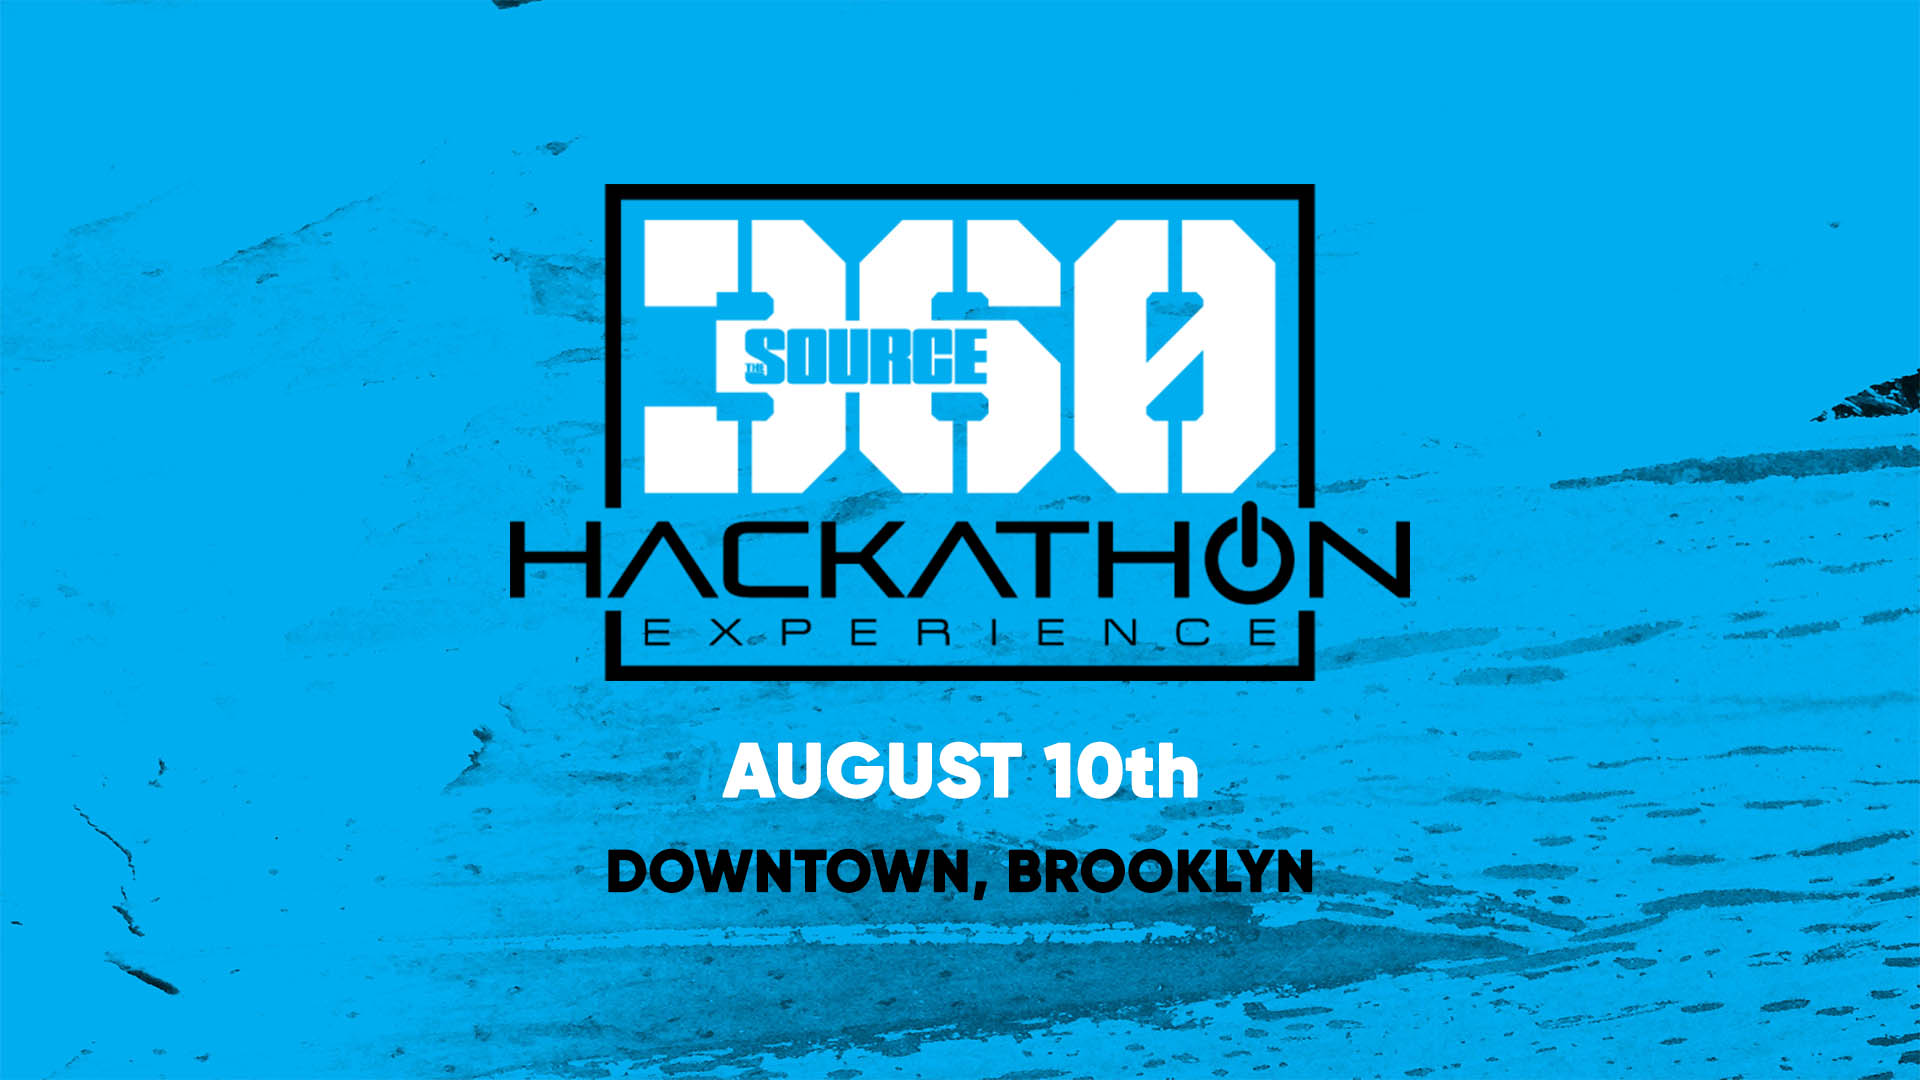 Hackathon date